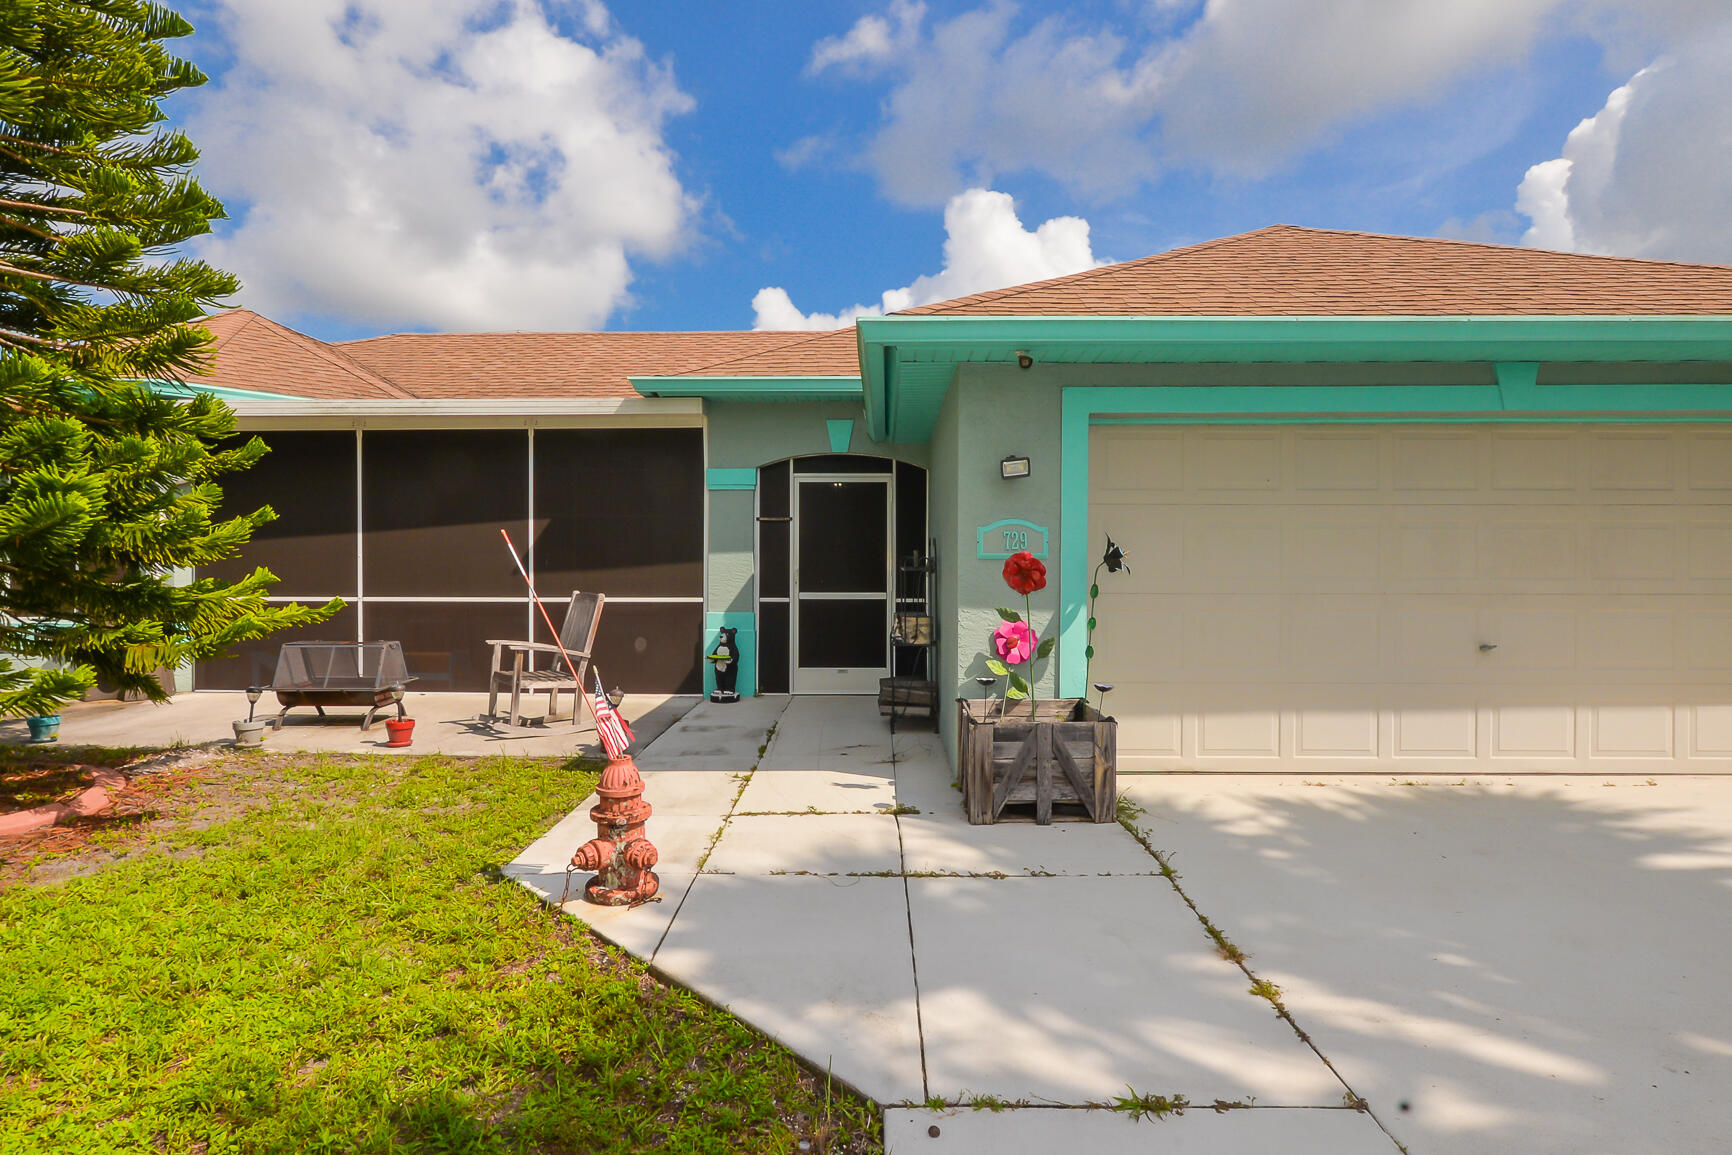 729 Tatum Terrace, Port Saint Lucie, Florida 34953, 4 Bedrooms Bedrooms, ,2 BathroomsBathrooms,A,Single family,Tatum,RX-10734504